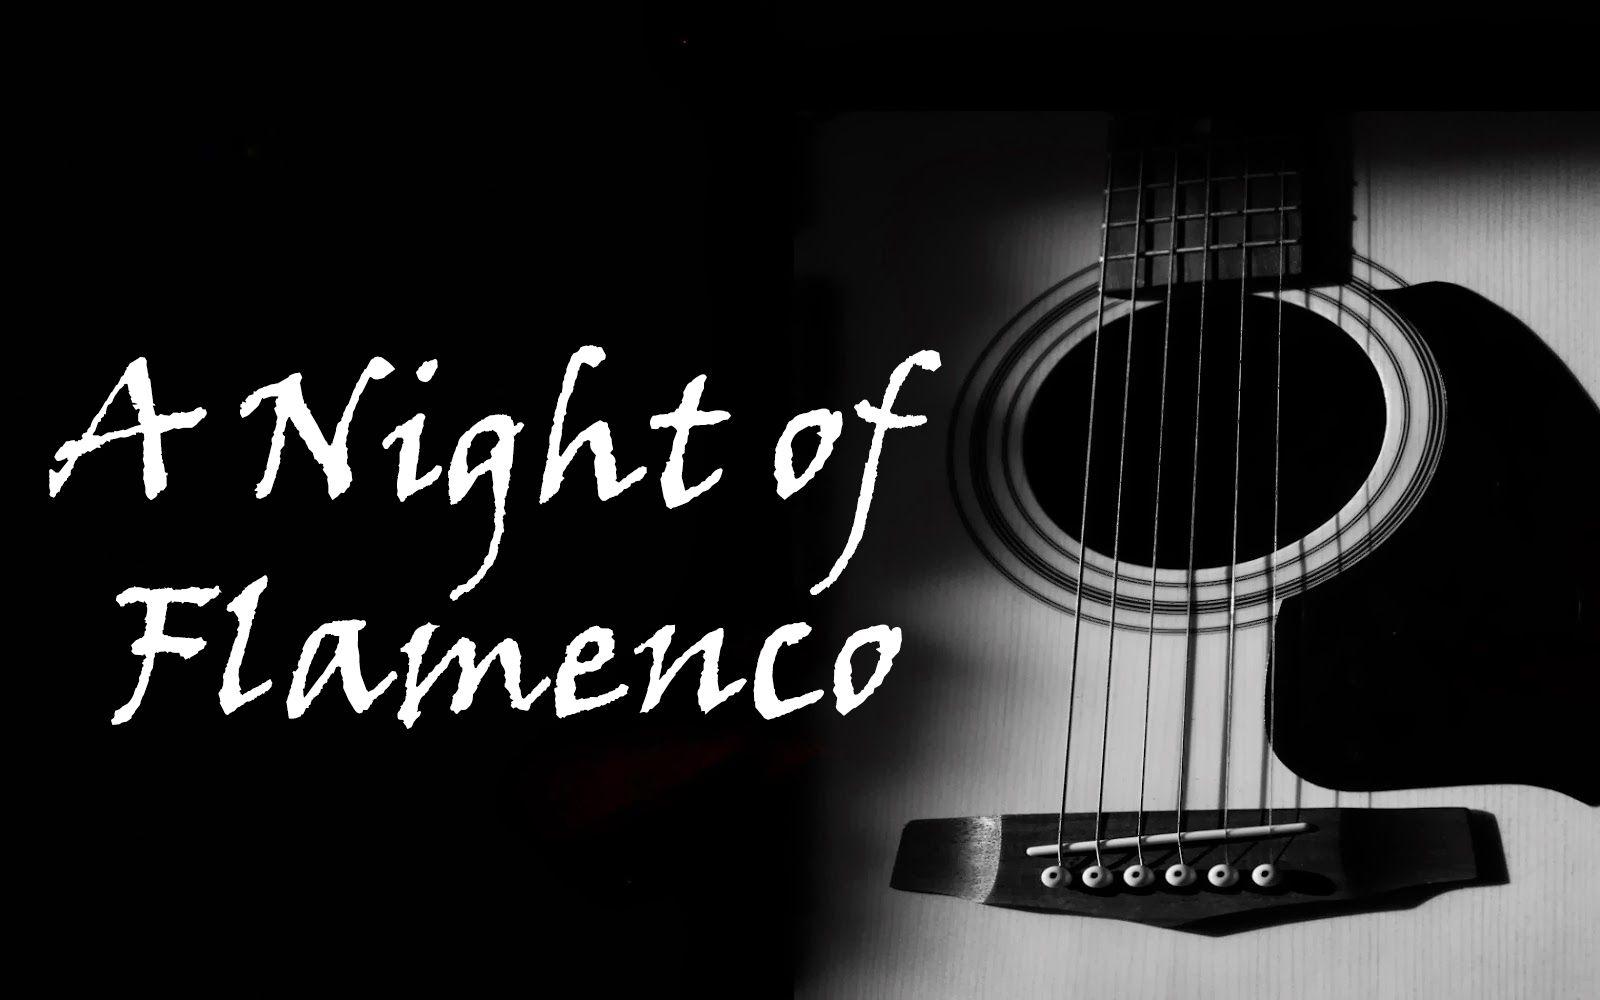 A night of Flamenco - Lord 909